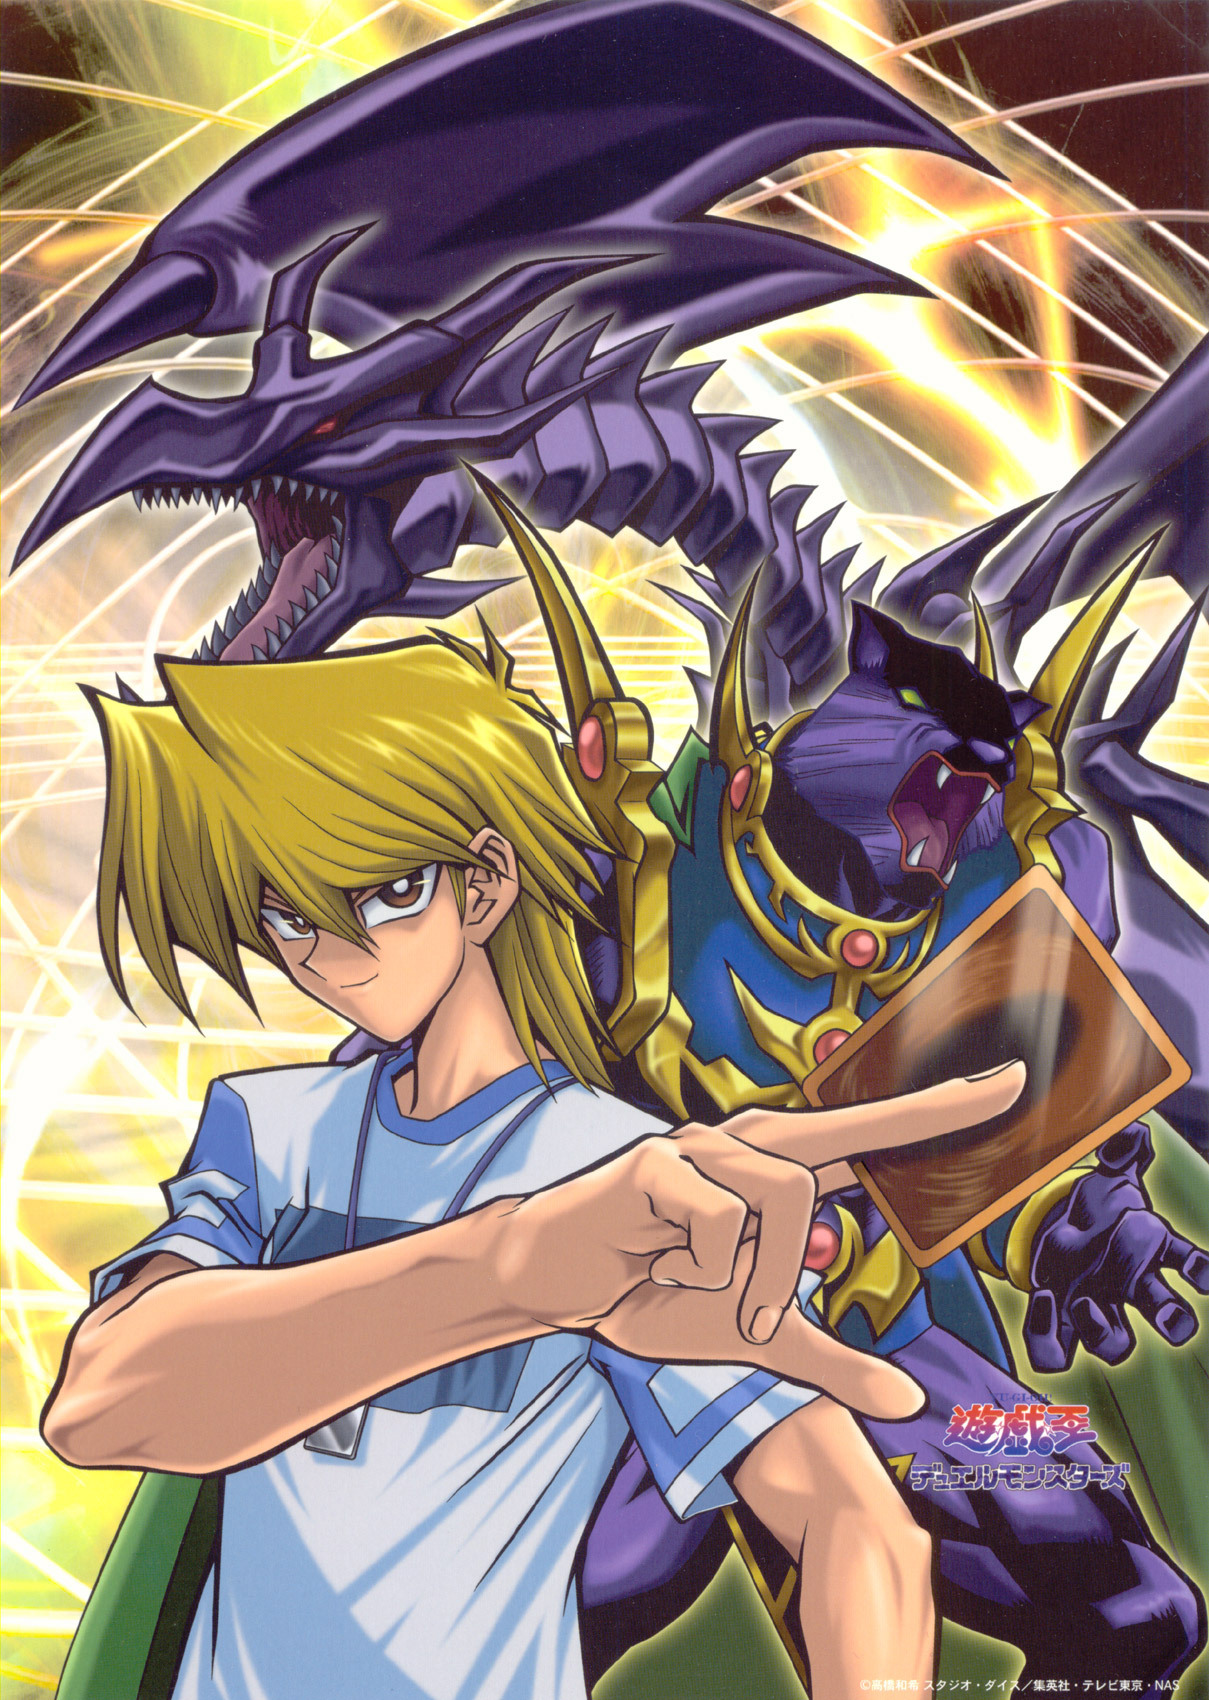 jounouchi katsuya joey wheeler yu gi oh duel monsters